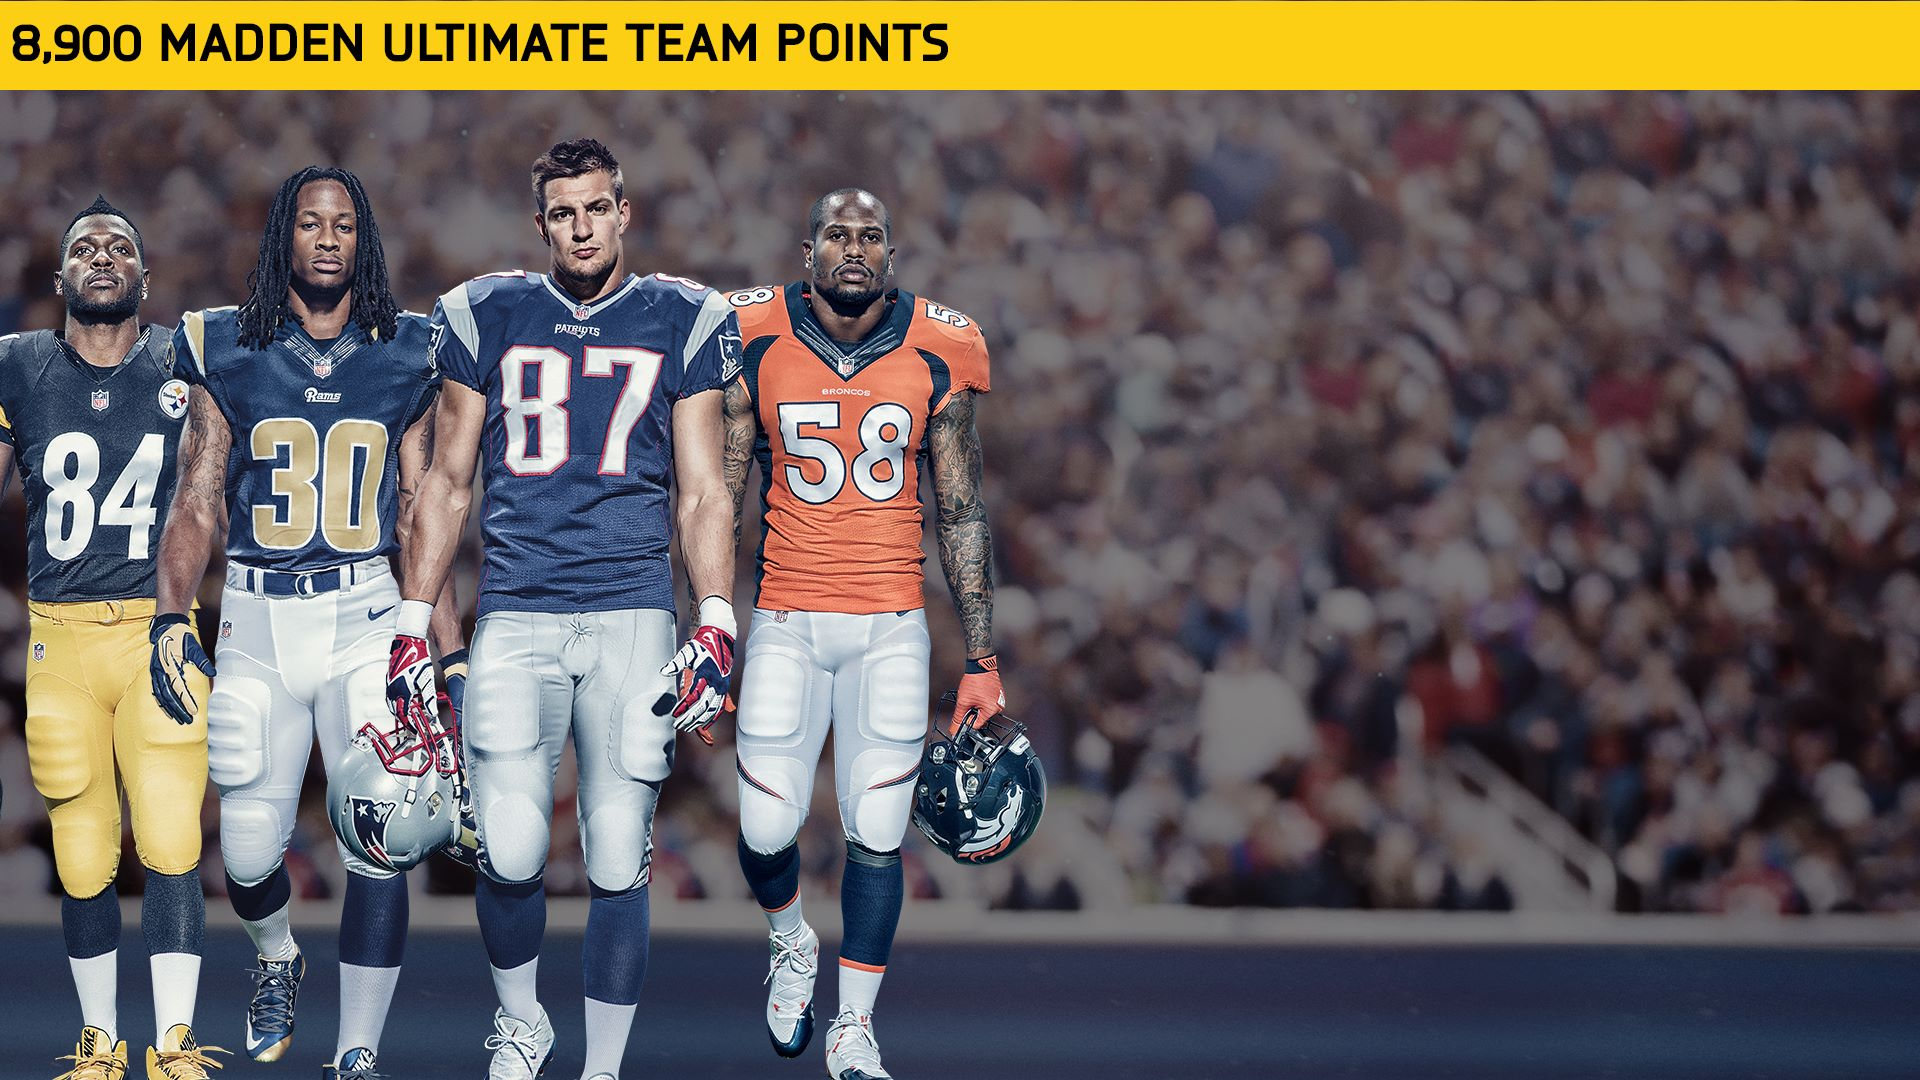 8900 Madden NFL 17 Points